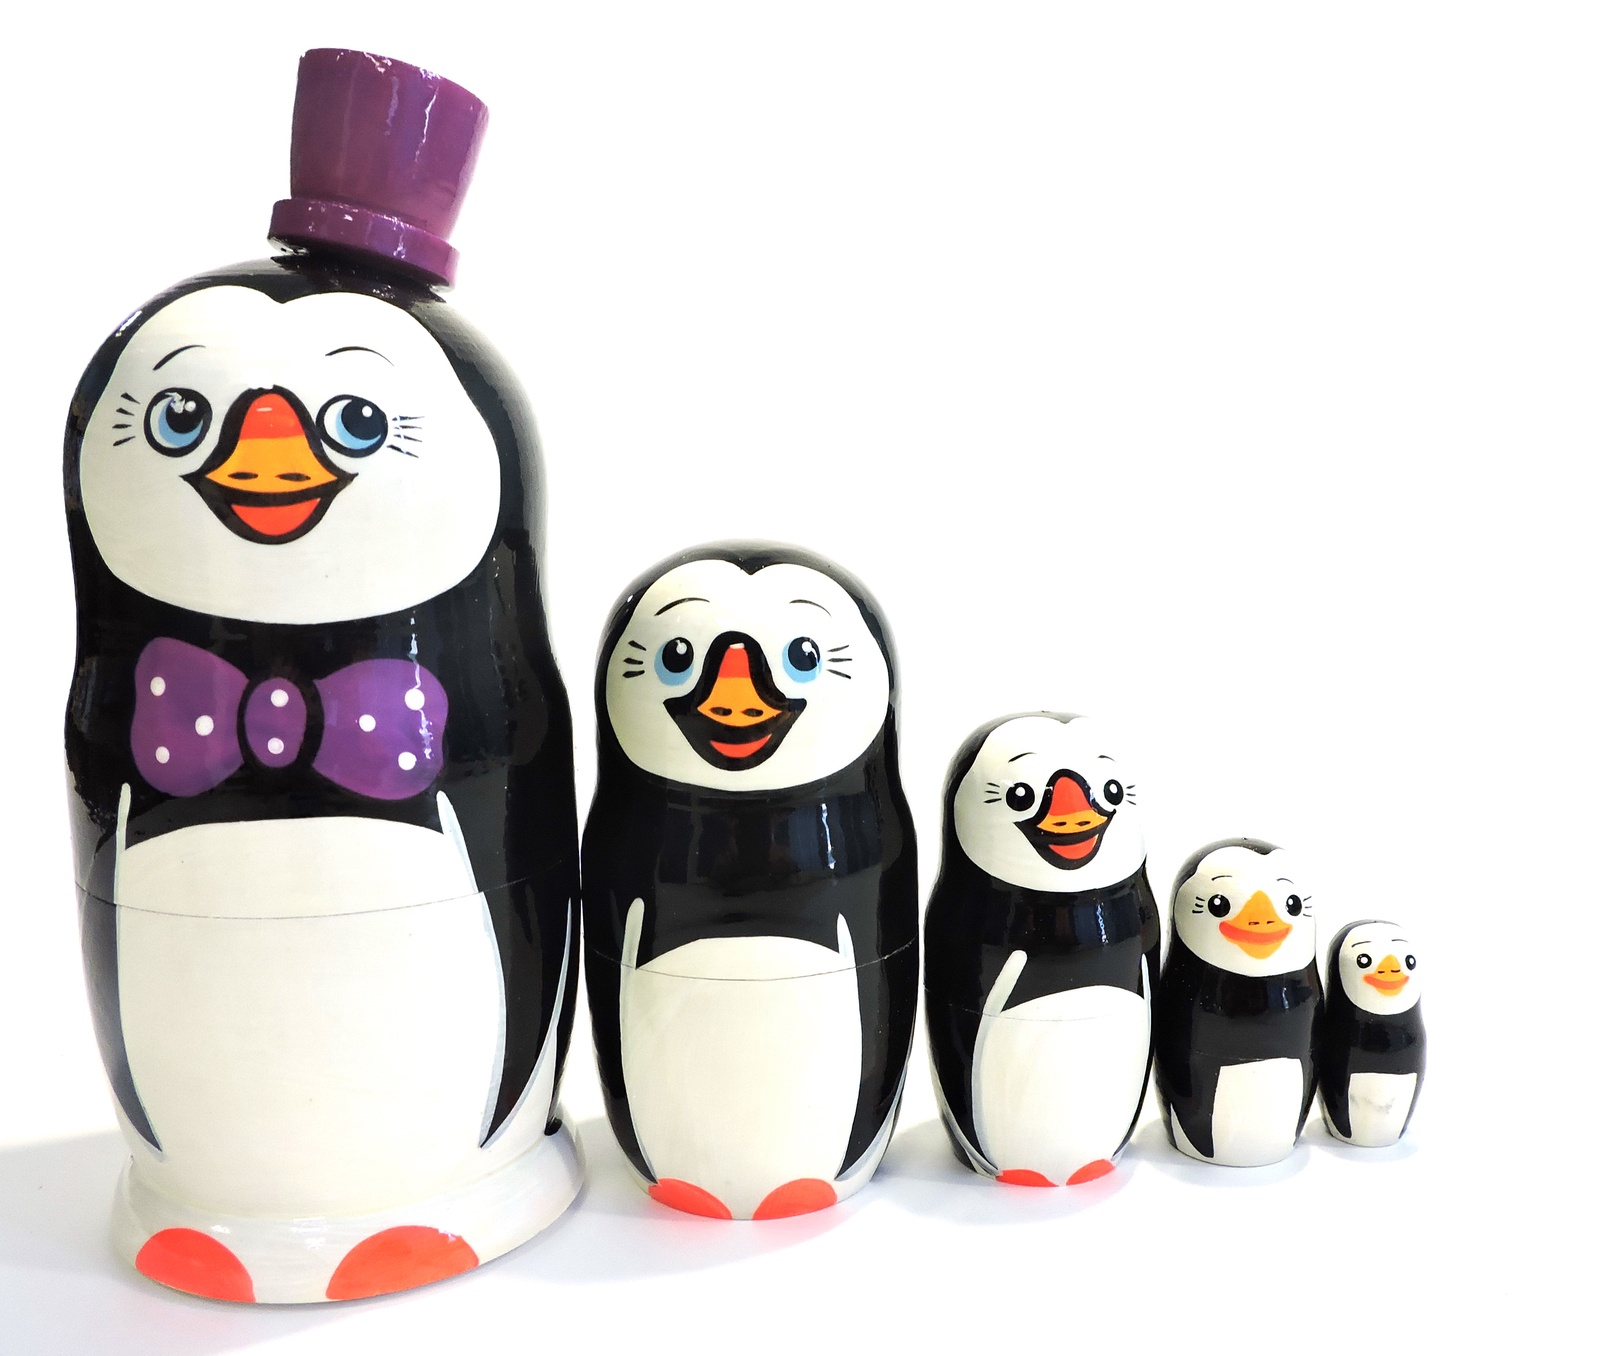 Матрешка Taowa Пингвины, из 5 кукол, 045-127-5, фиолетовый, черный, 7,5 х 7,5 х 17,5 см цена